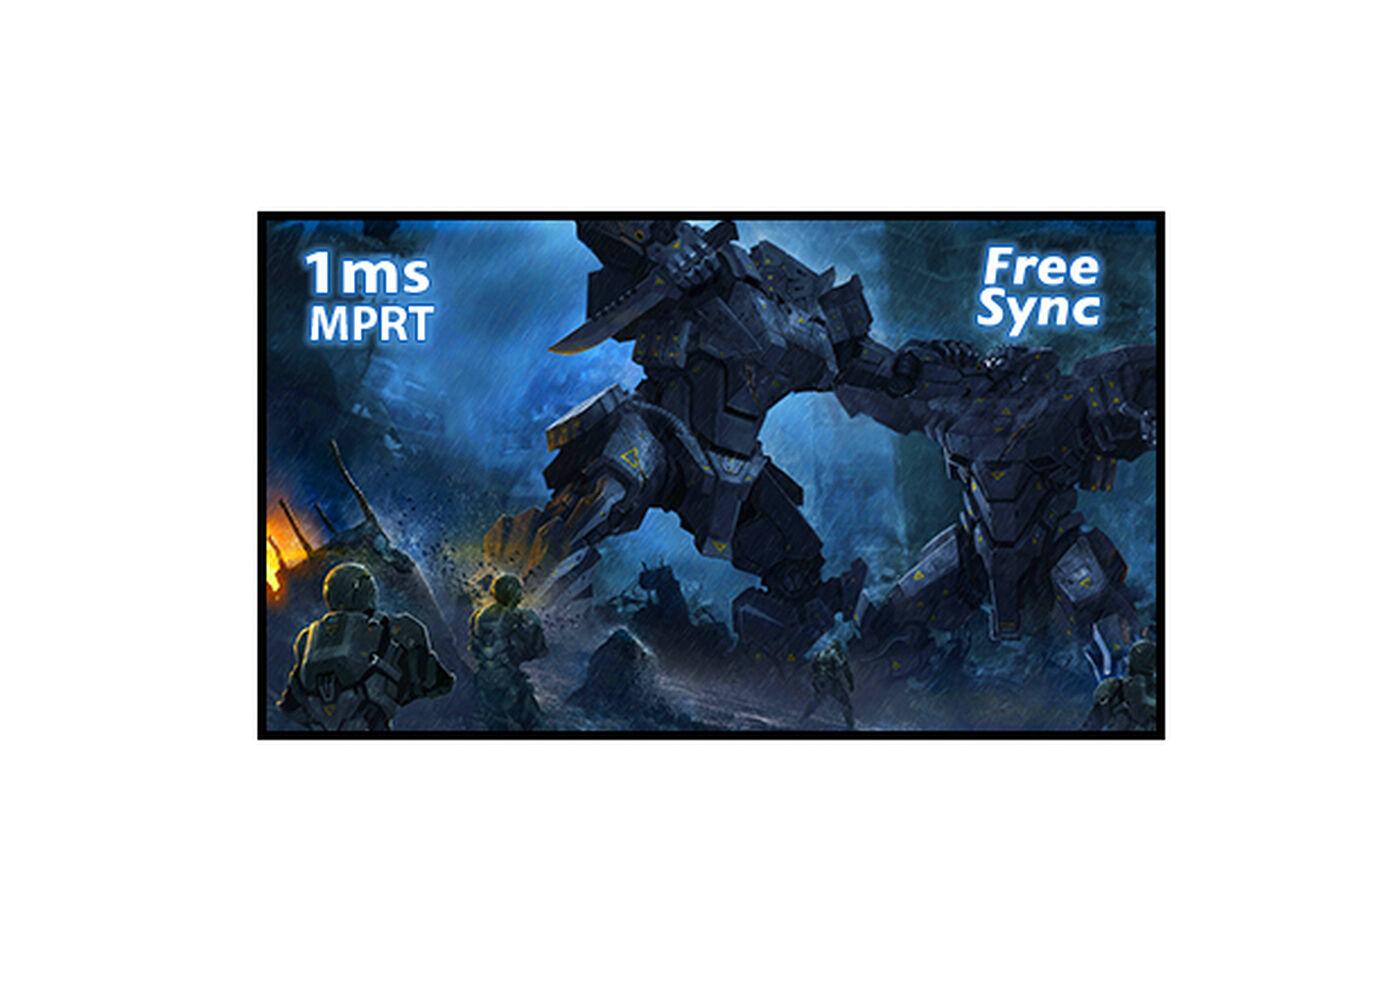 FreeSync™ & 1ms MPRT